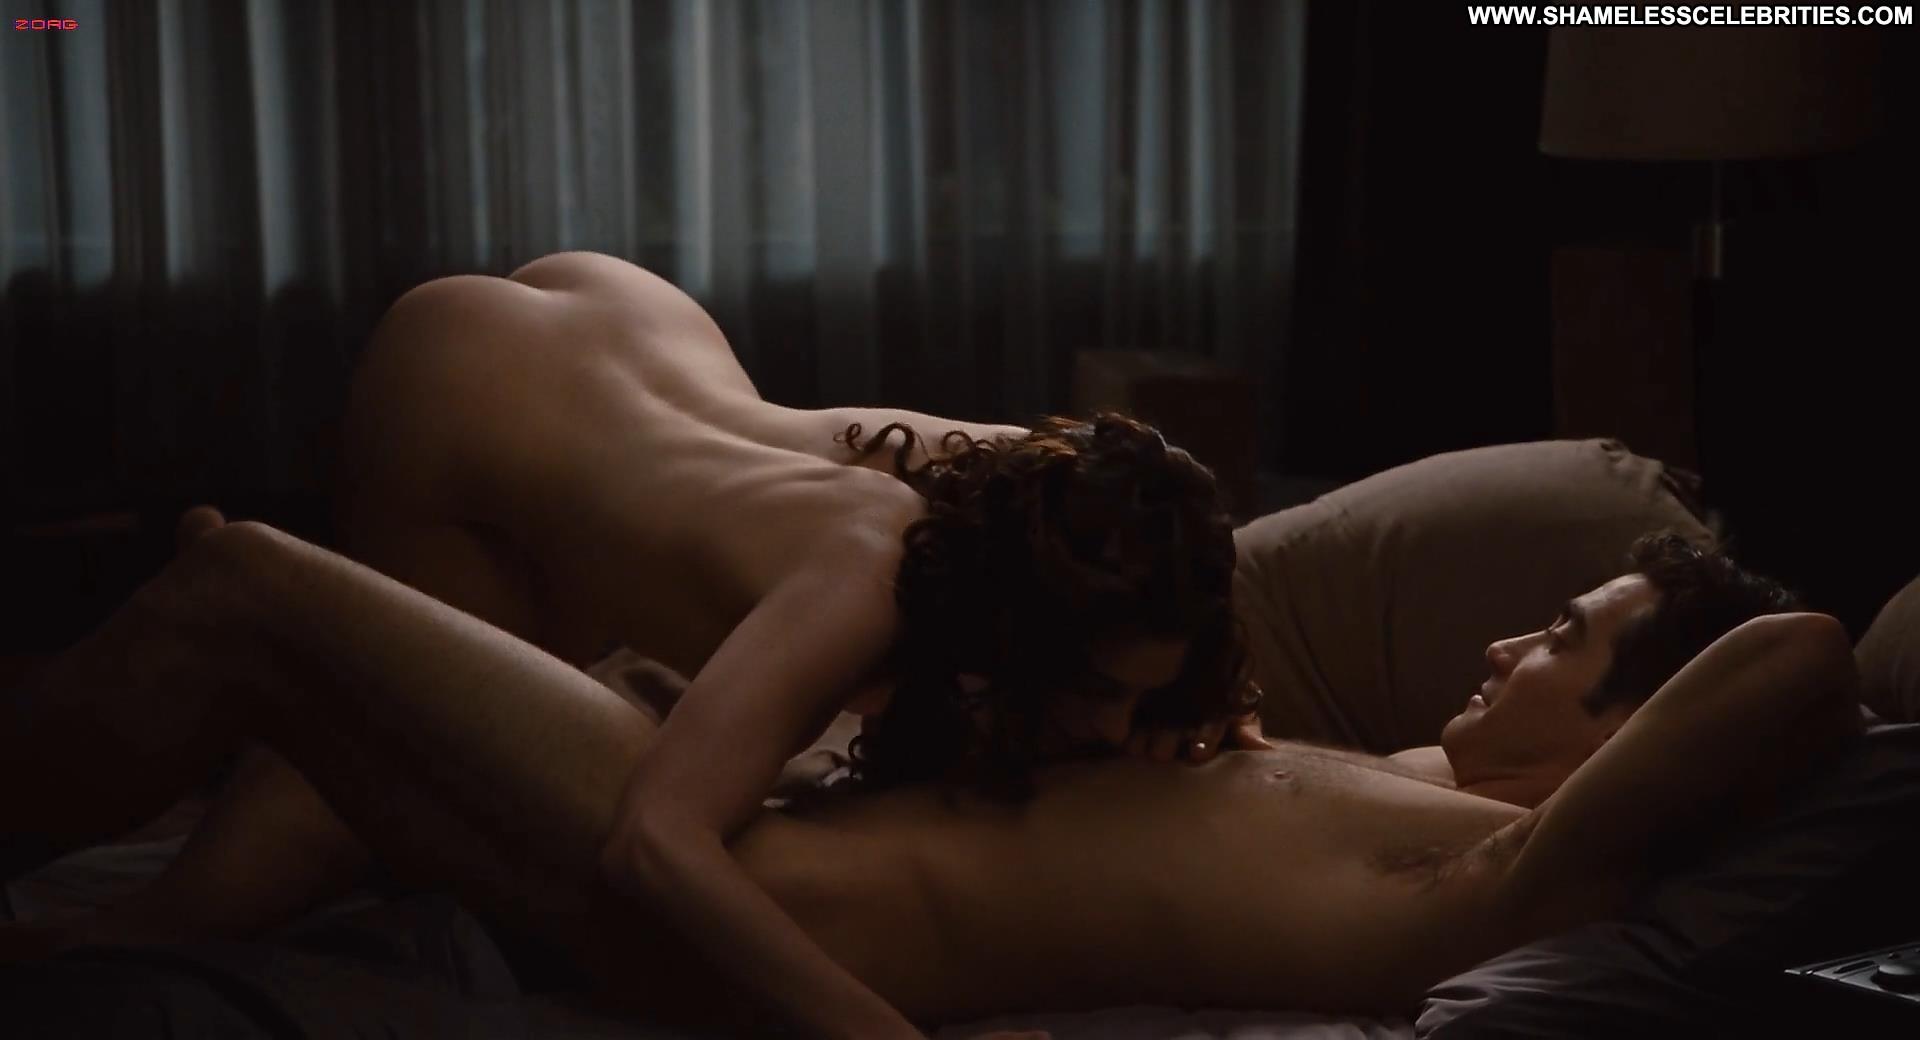 icarly nude having sex